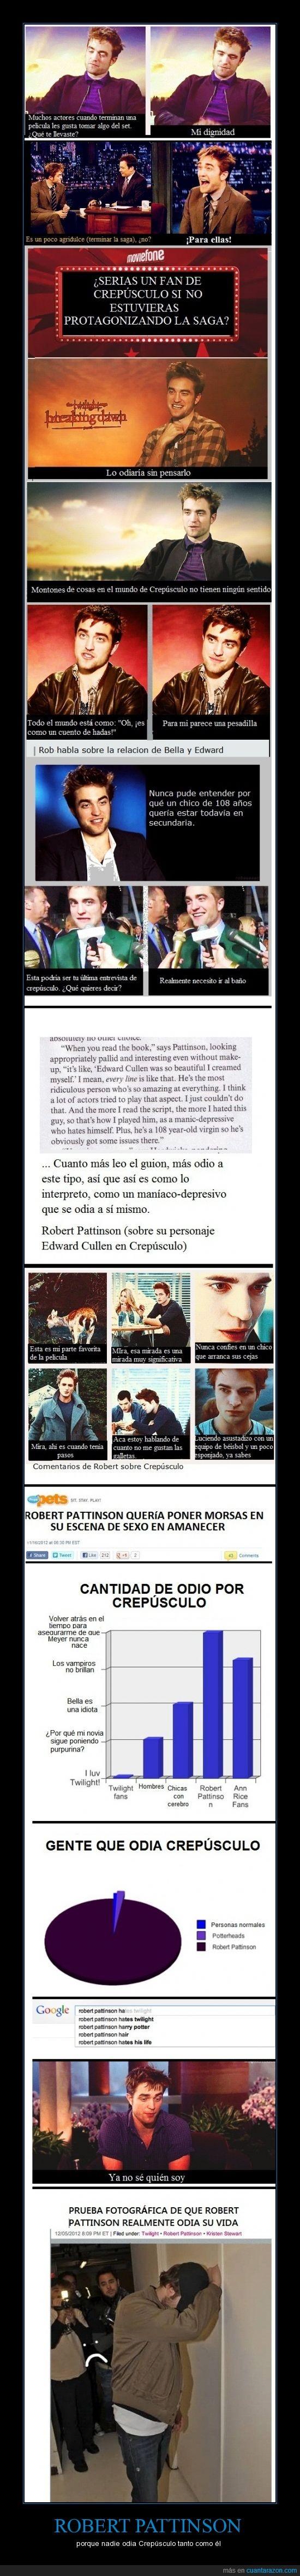 Crepúsculo,cullen,Edward,odia,Robert Pattinson,se canso de brillar,twilight